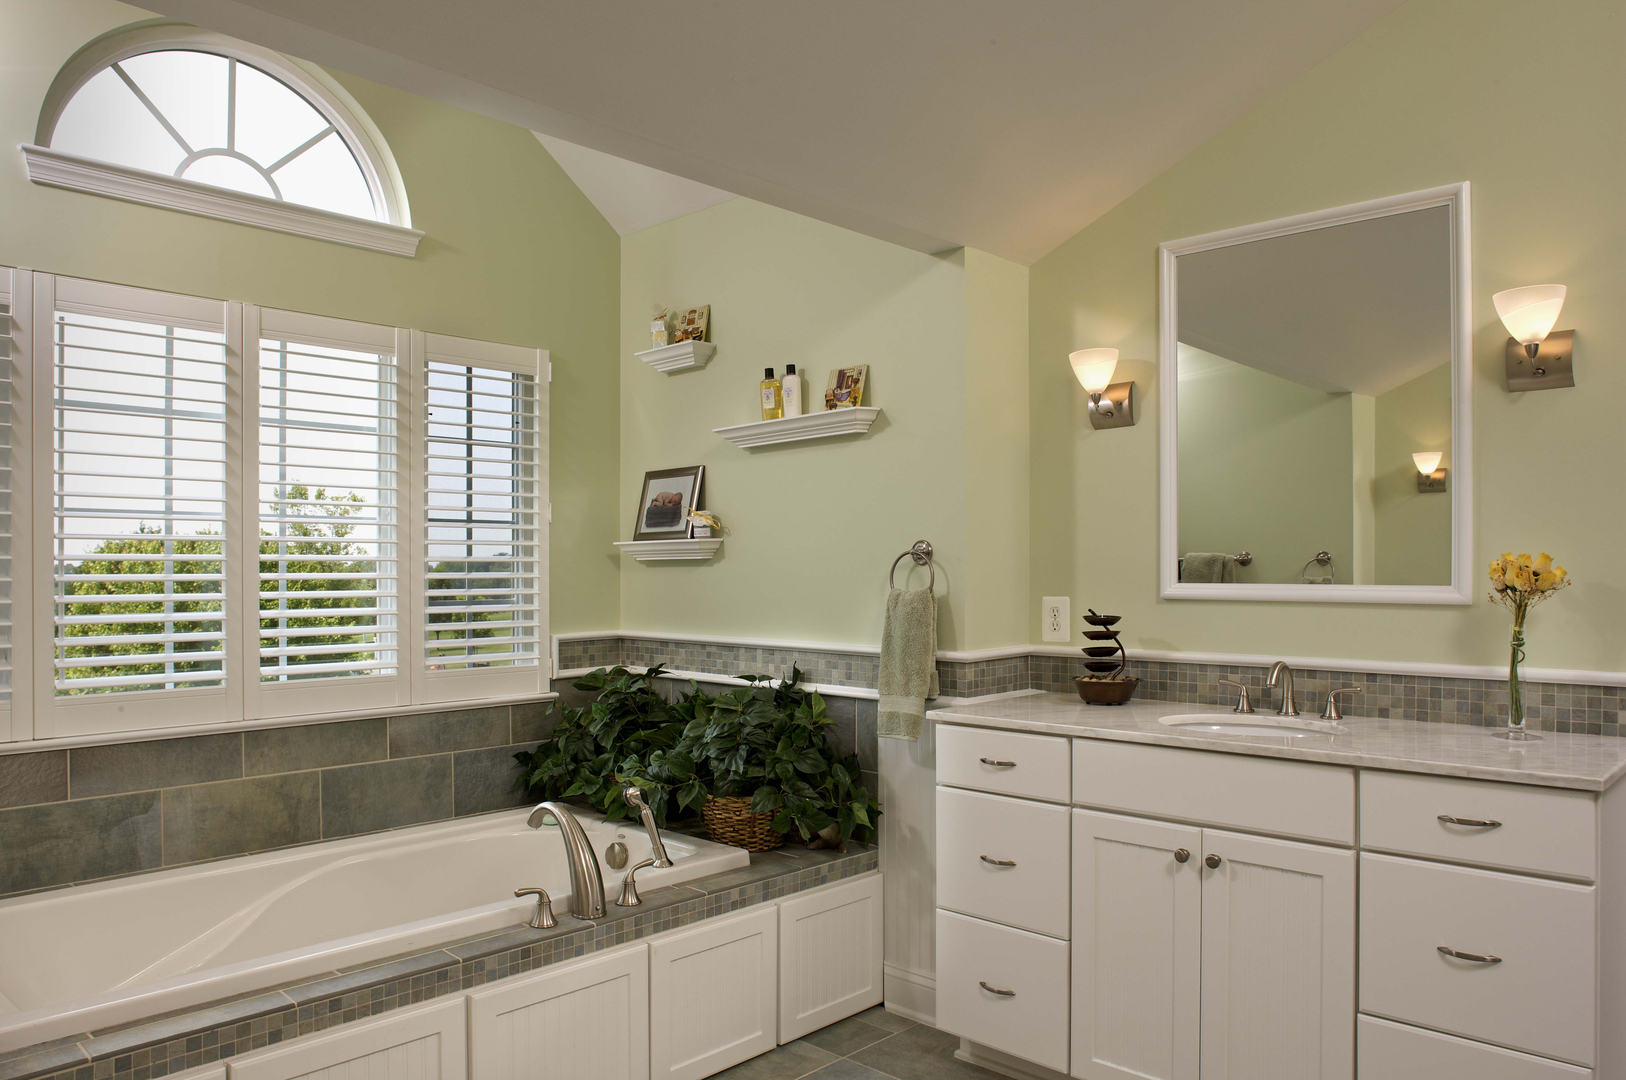 Bathroom Remodel Build It Boys Construction Yelm Wa - Bathroom remodel return on investment